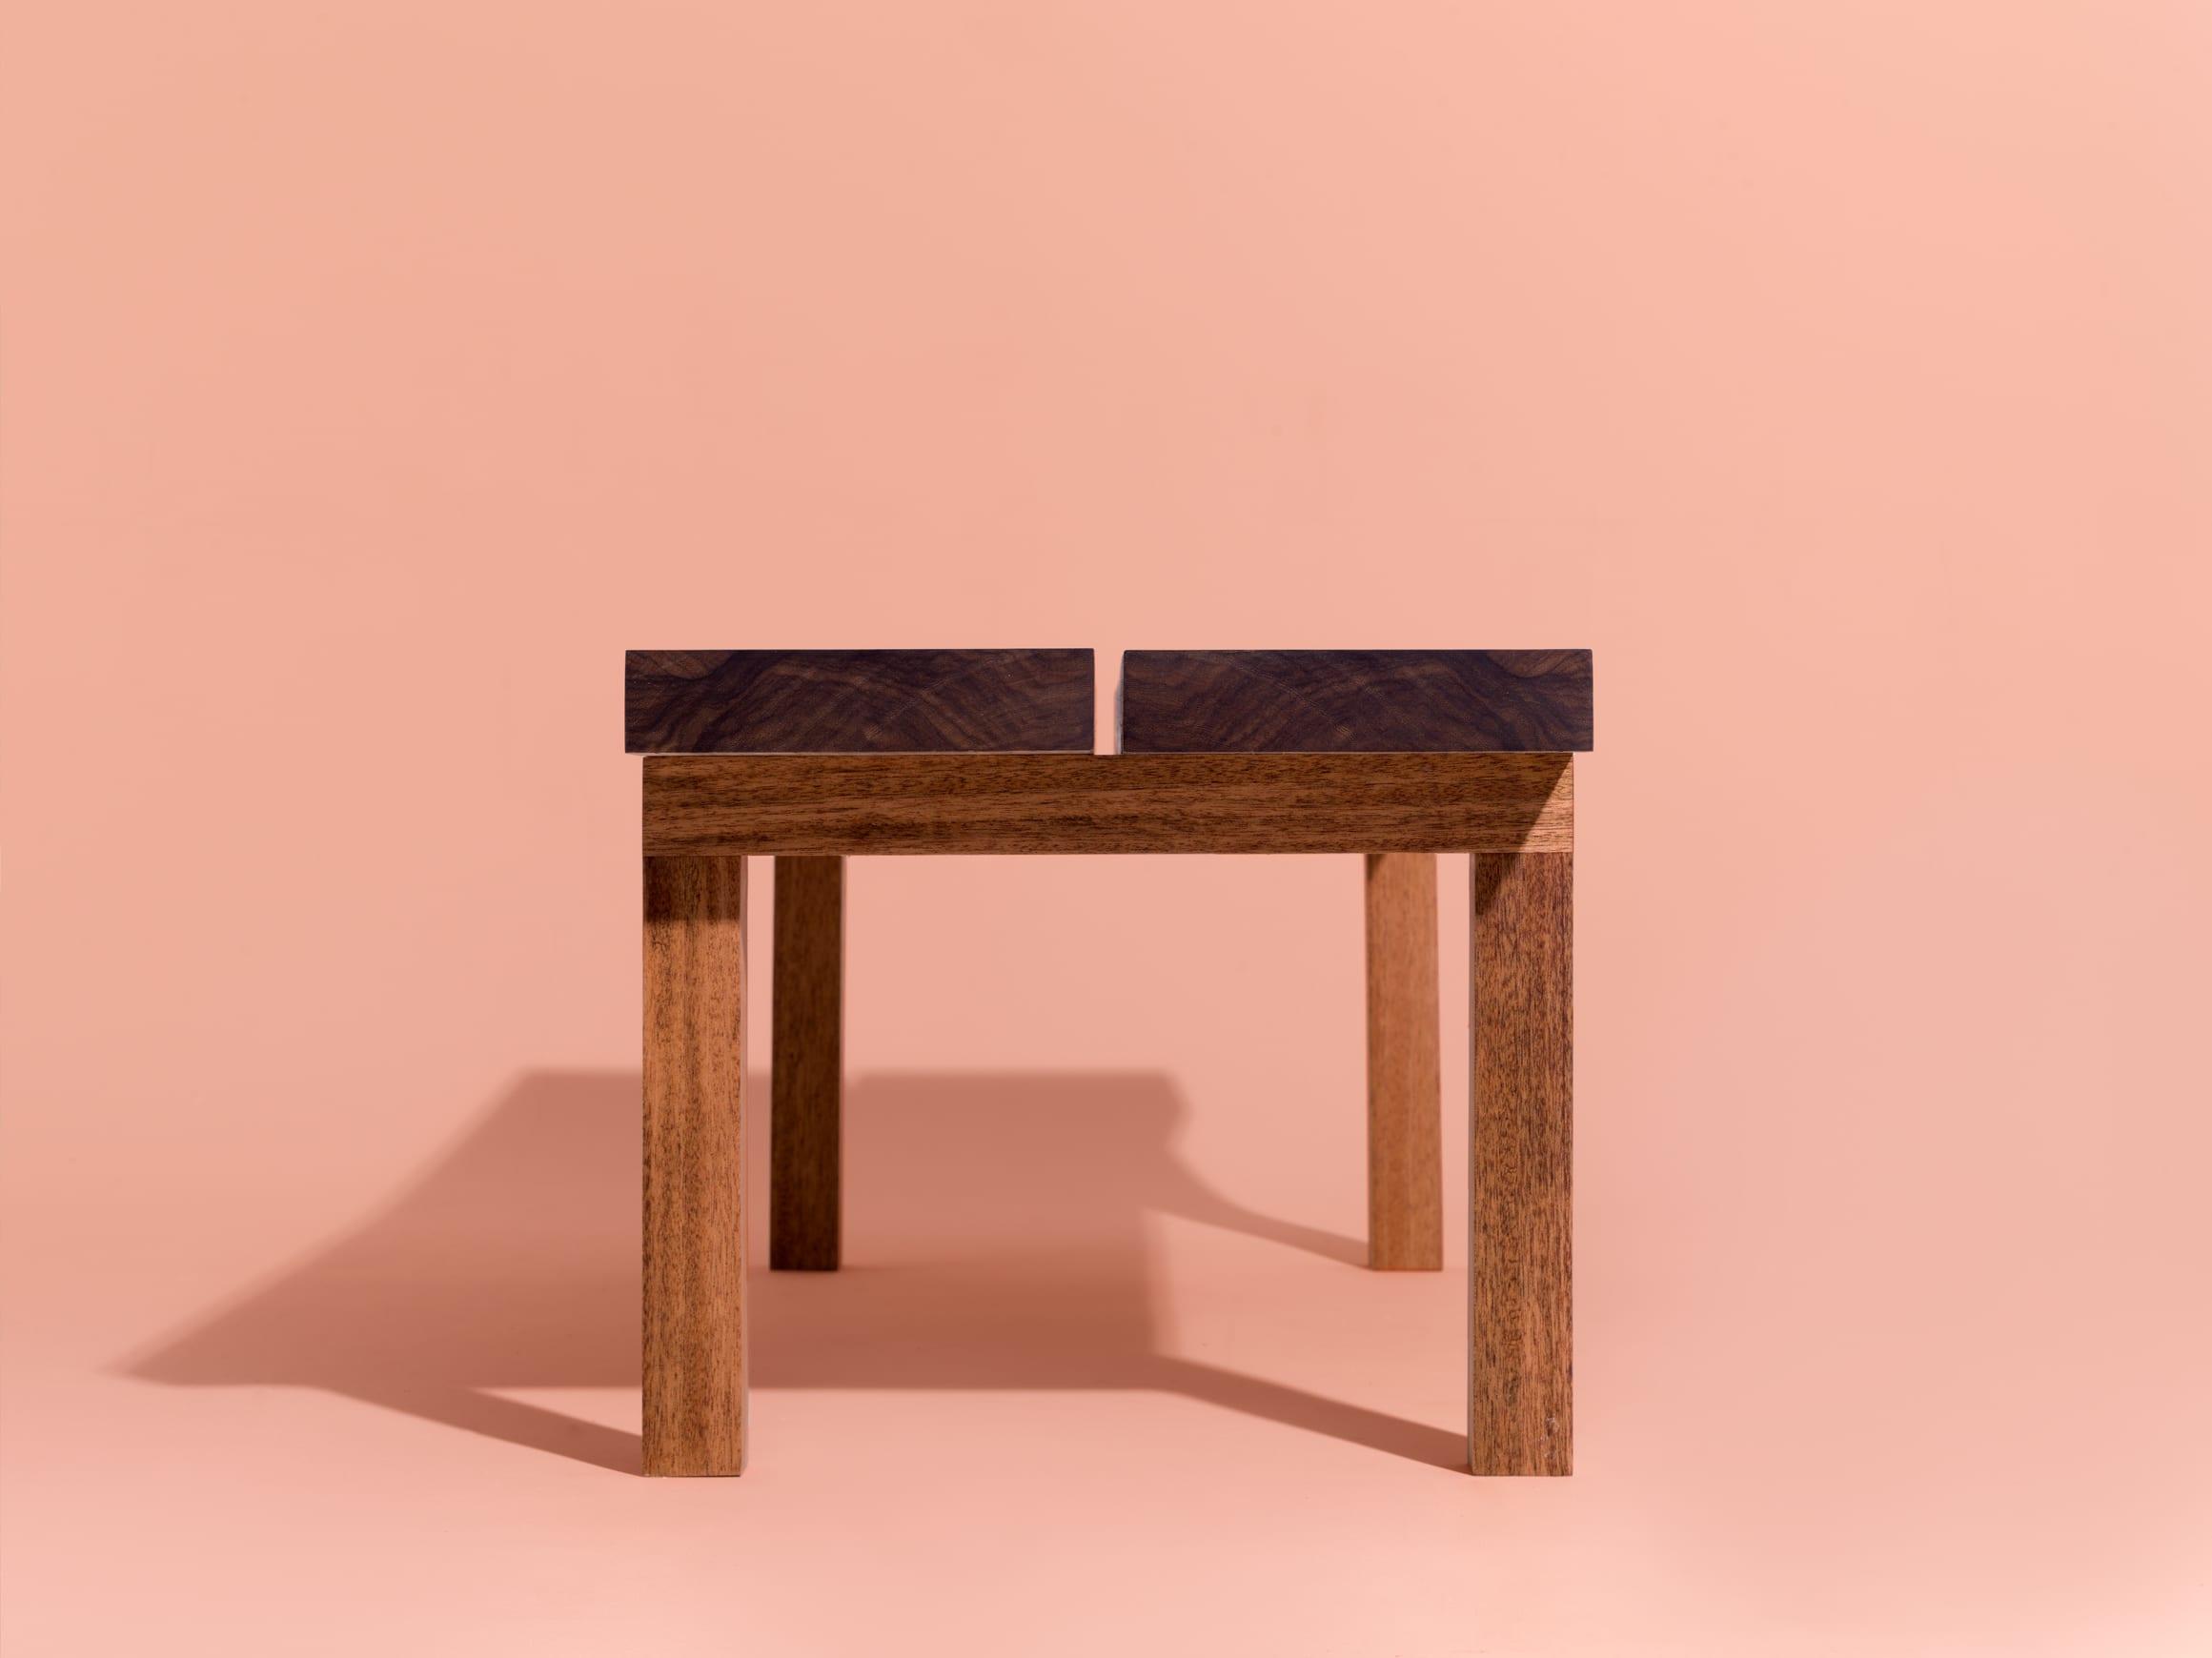 Coffee Table_web__0002_Layer Comp 3